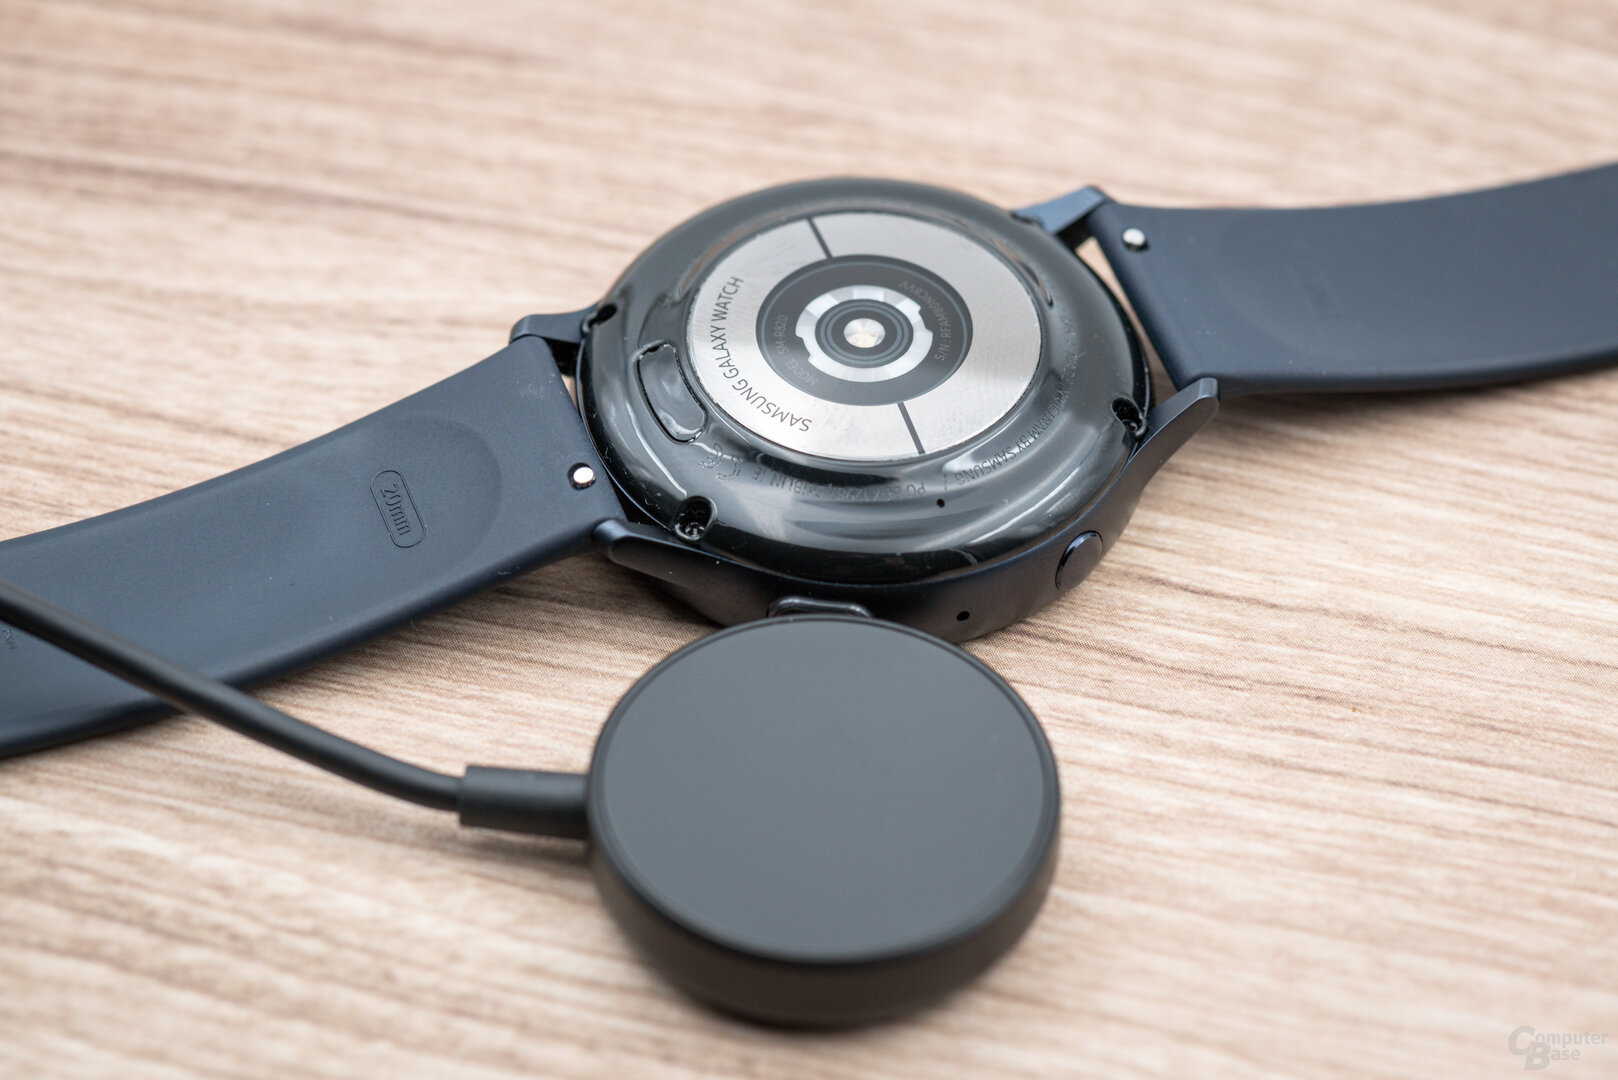 Samsung Galaxy Watch Active 2: Ladesystem